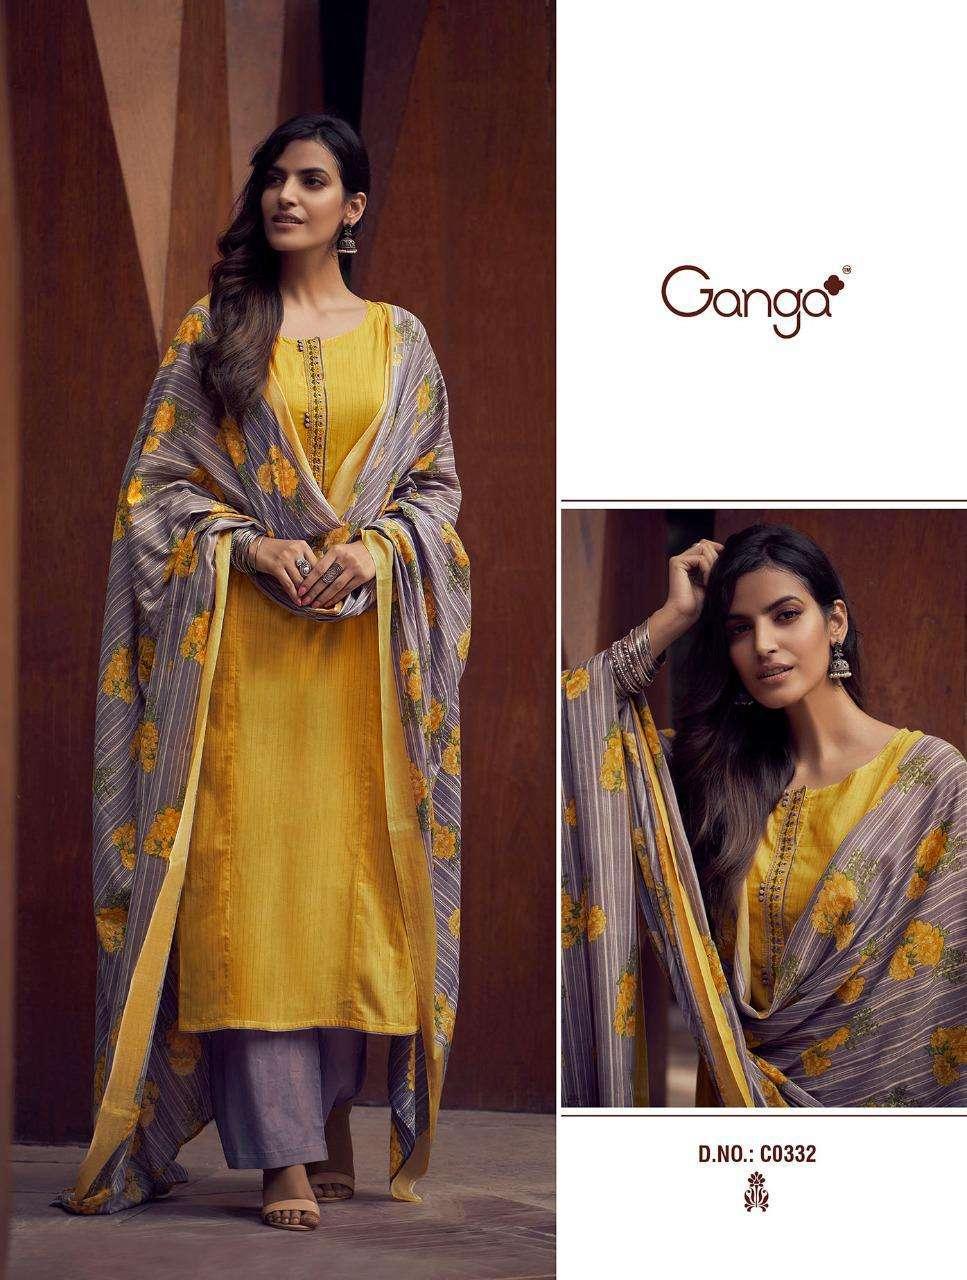 Ganga Fashion - Seerat